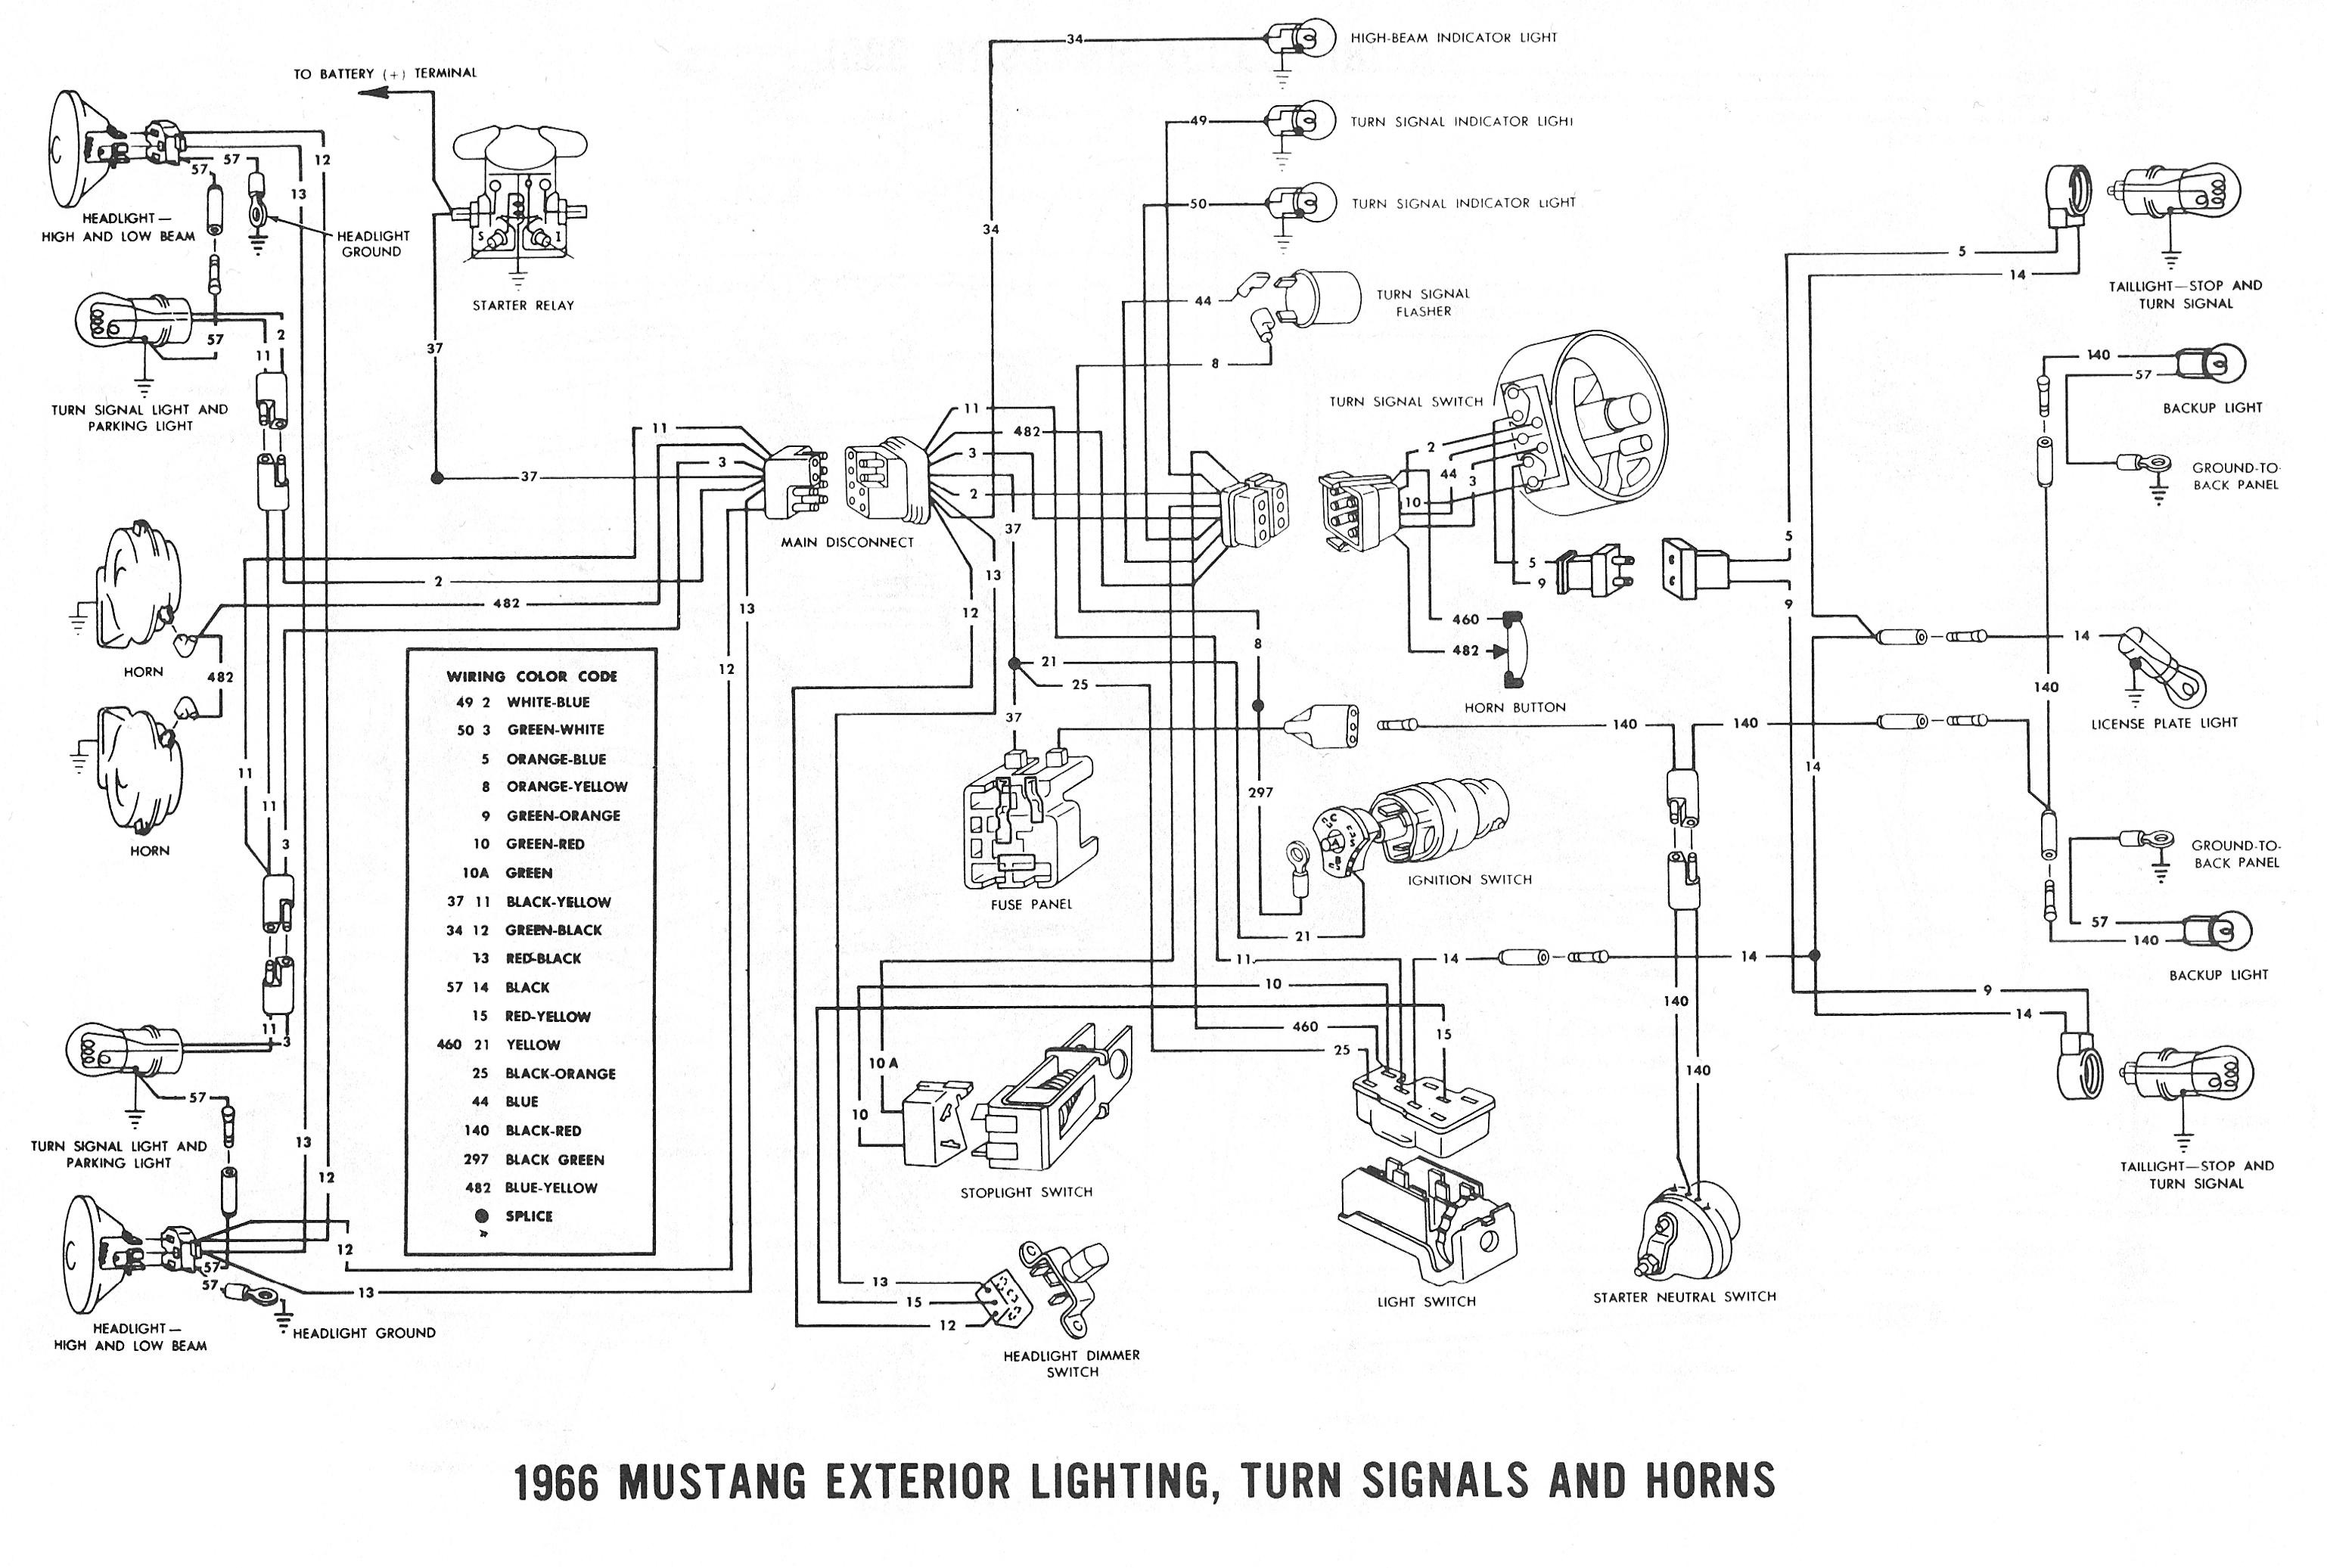 1966 Ford F100 Generator Wiring Diagram Diy Enthusiasts 1973 Man Truck Electrical Diesel Control Panel Rh Detoxicrecenze Com